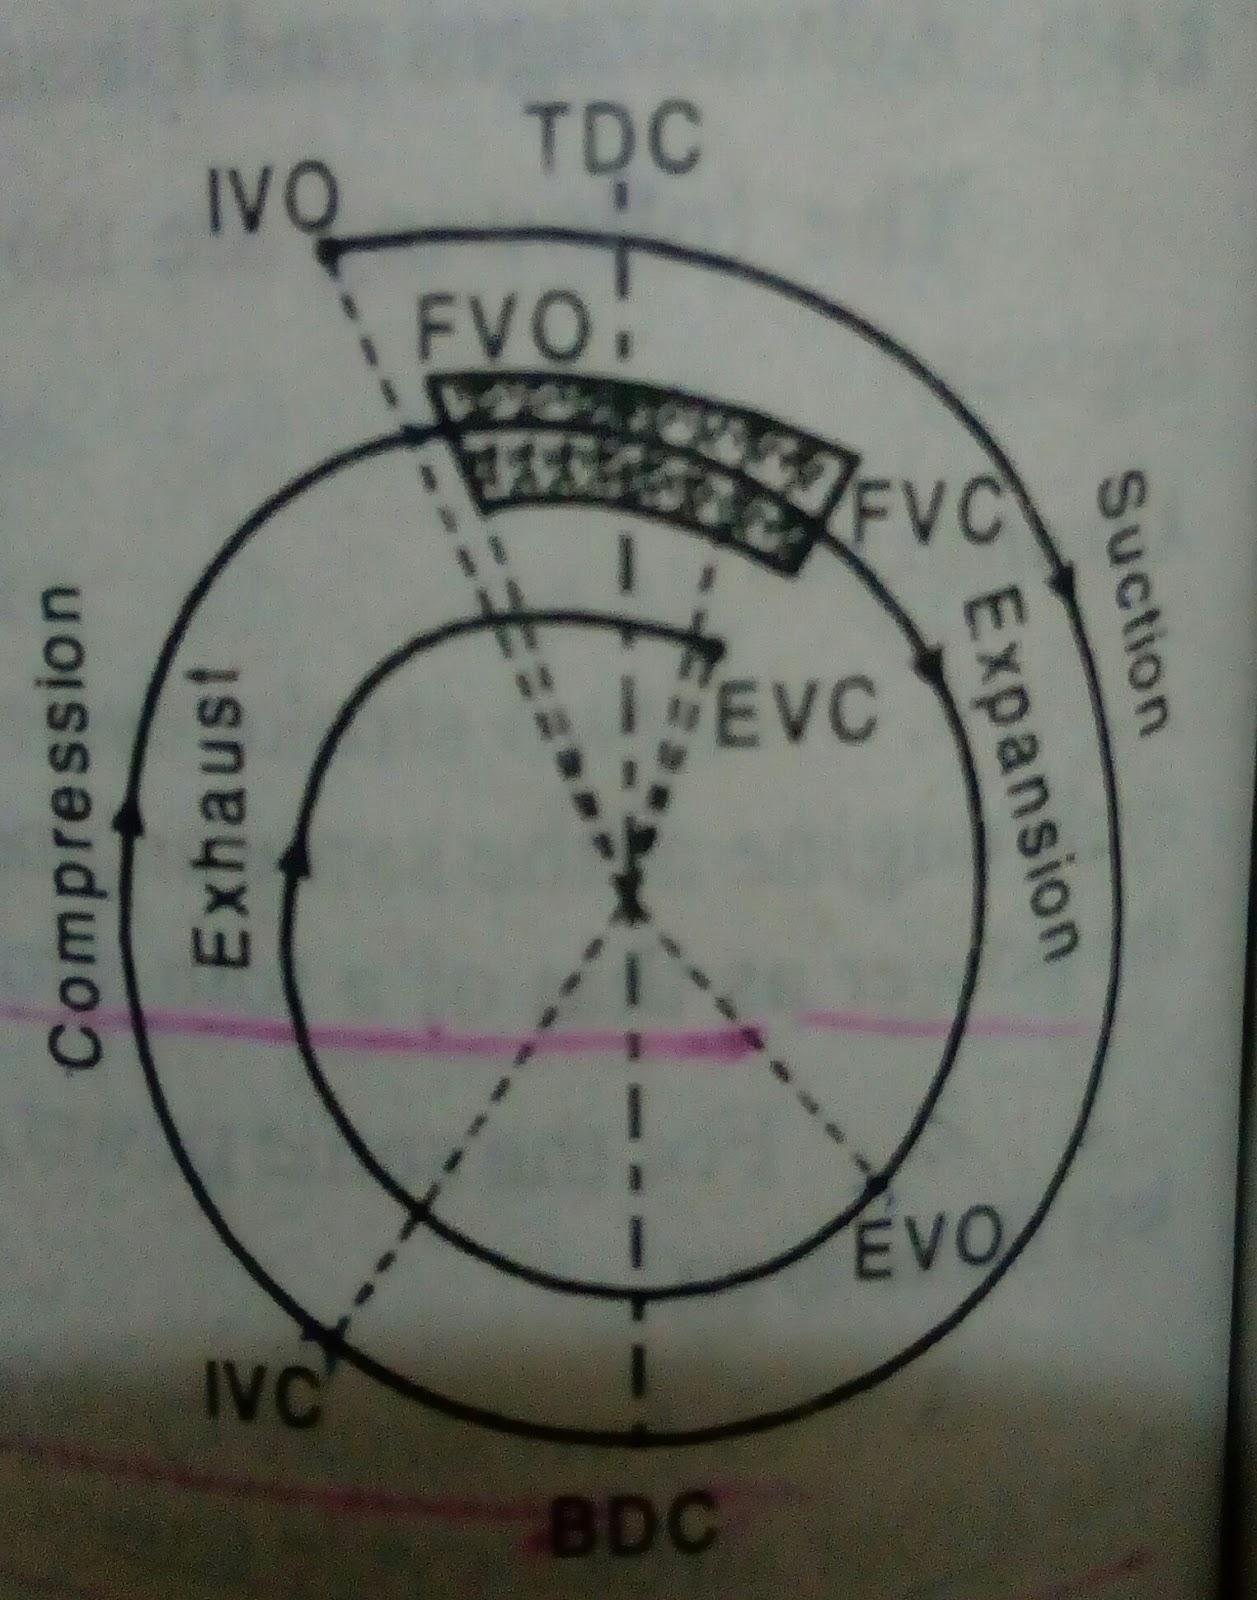 Valve Timing Diagram For 4 Stroke Diesel Engine 1998 Subaru Impreza Wiring T S I C Engines Automobiles Ci